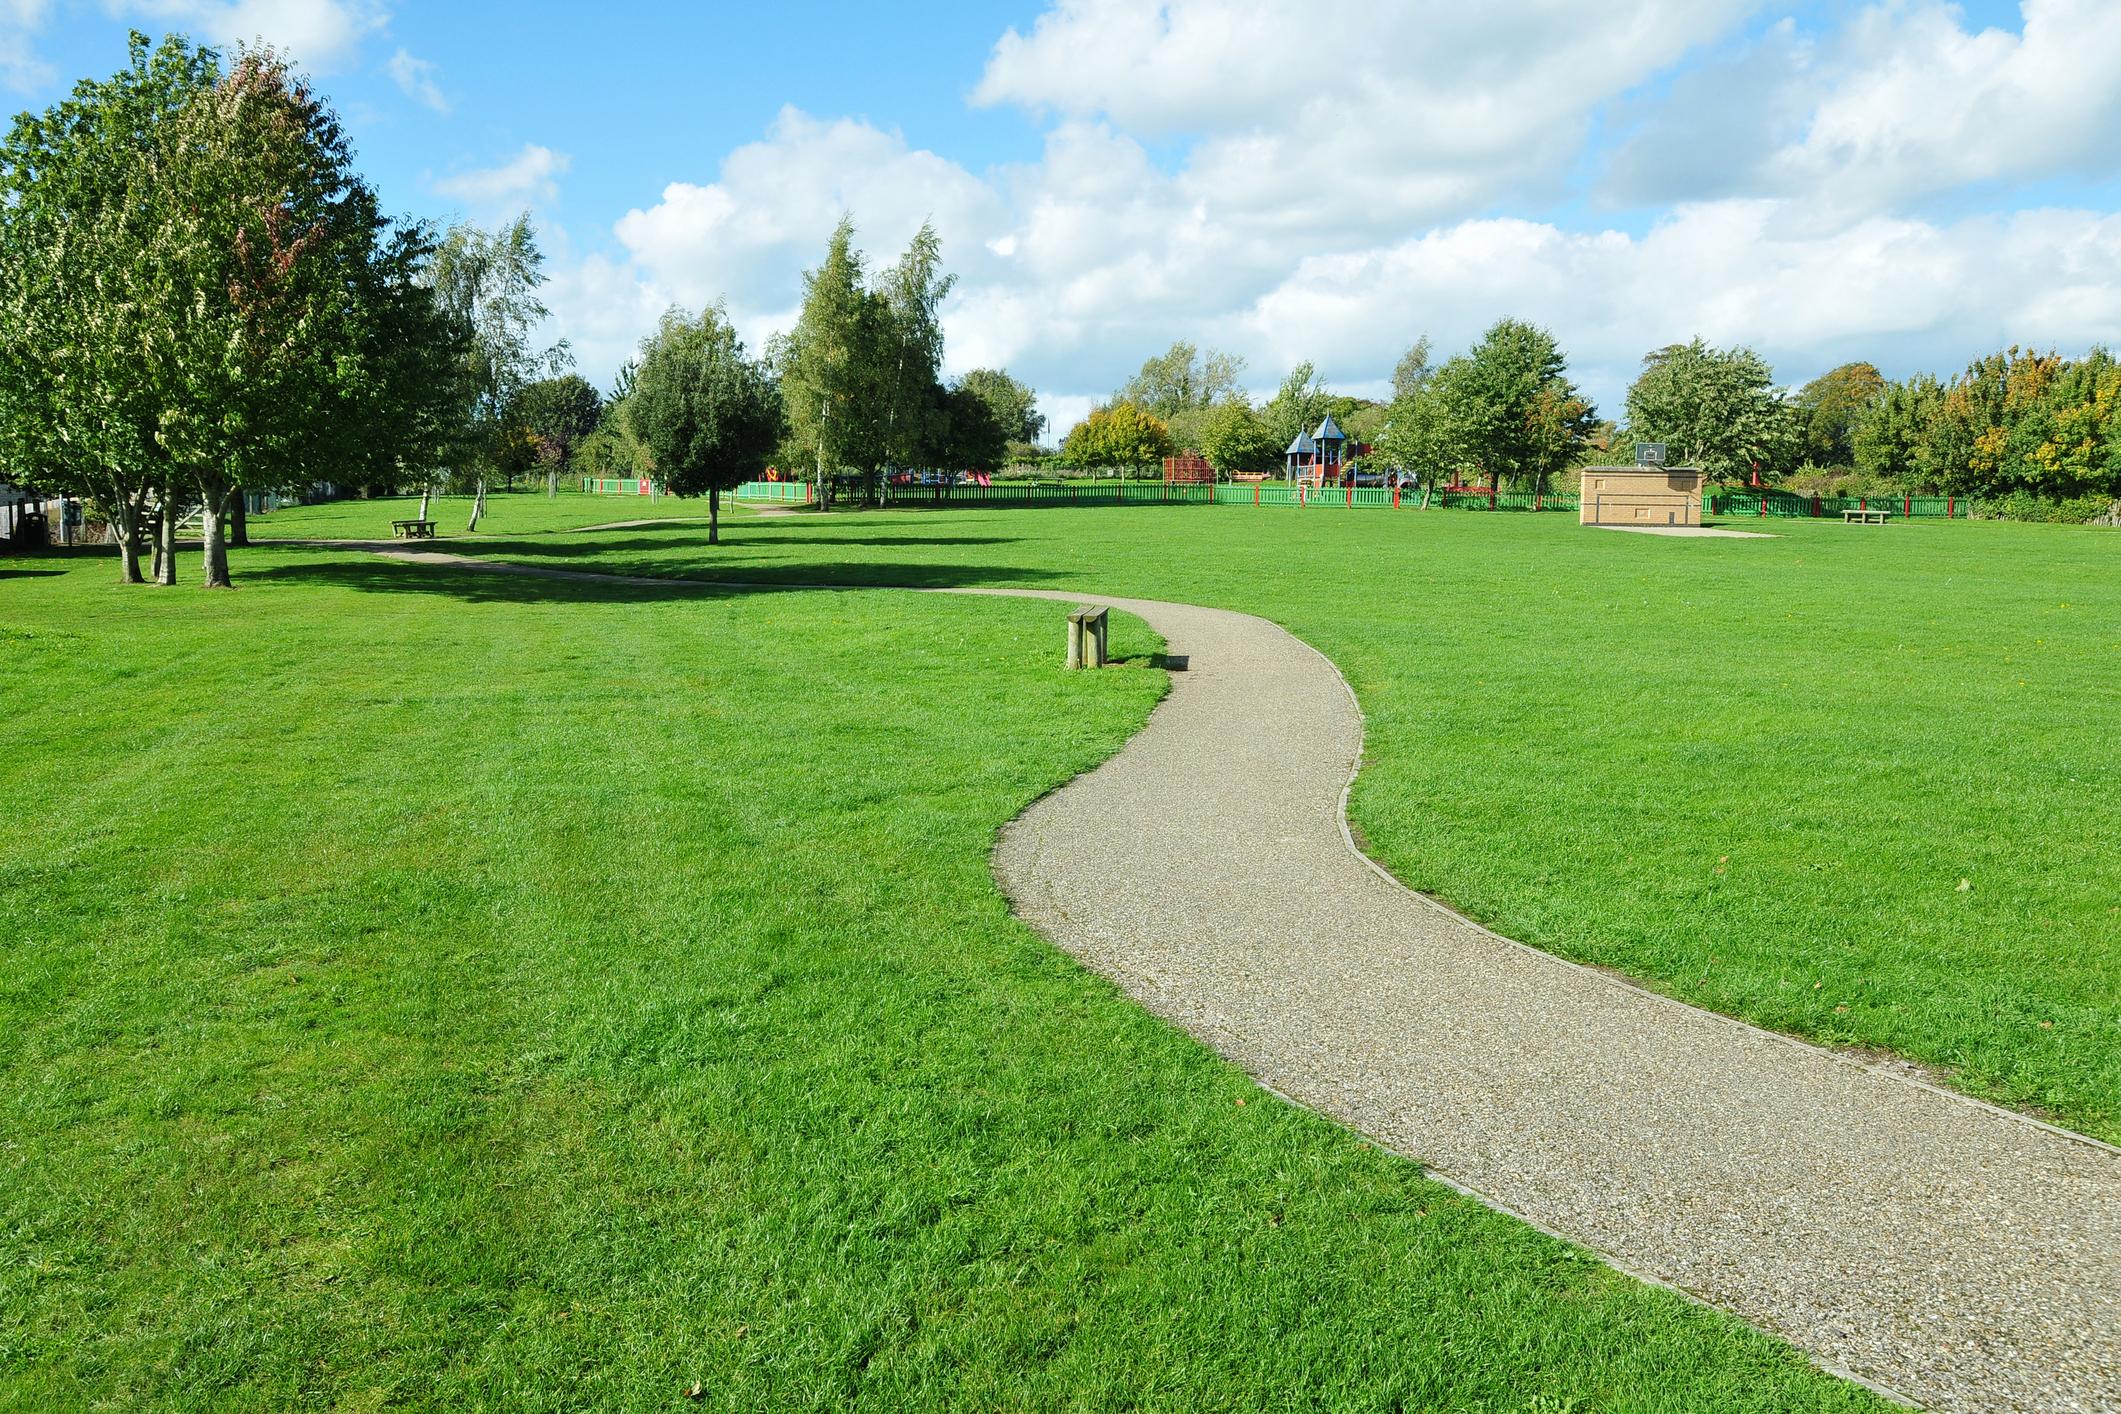 A park pathway